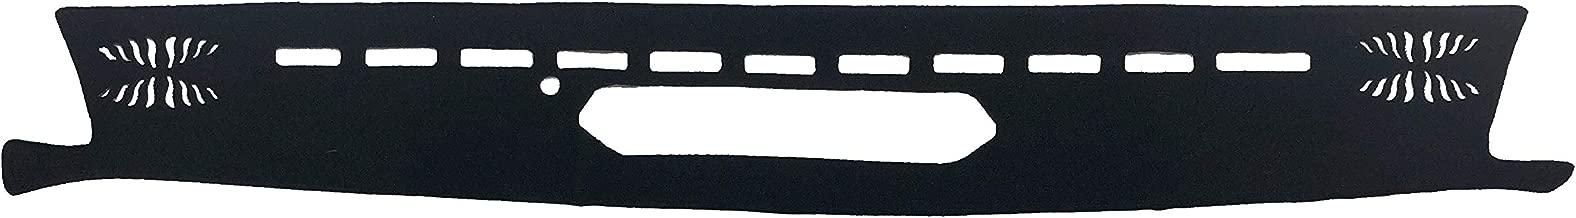 AutofitPro Custom Fit Dashboard Black Center Console Cover Dash Mat Protector Sunshield Cover for 2018 2019 2020 Jeep Wrangler (JL)